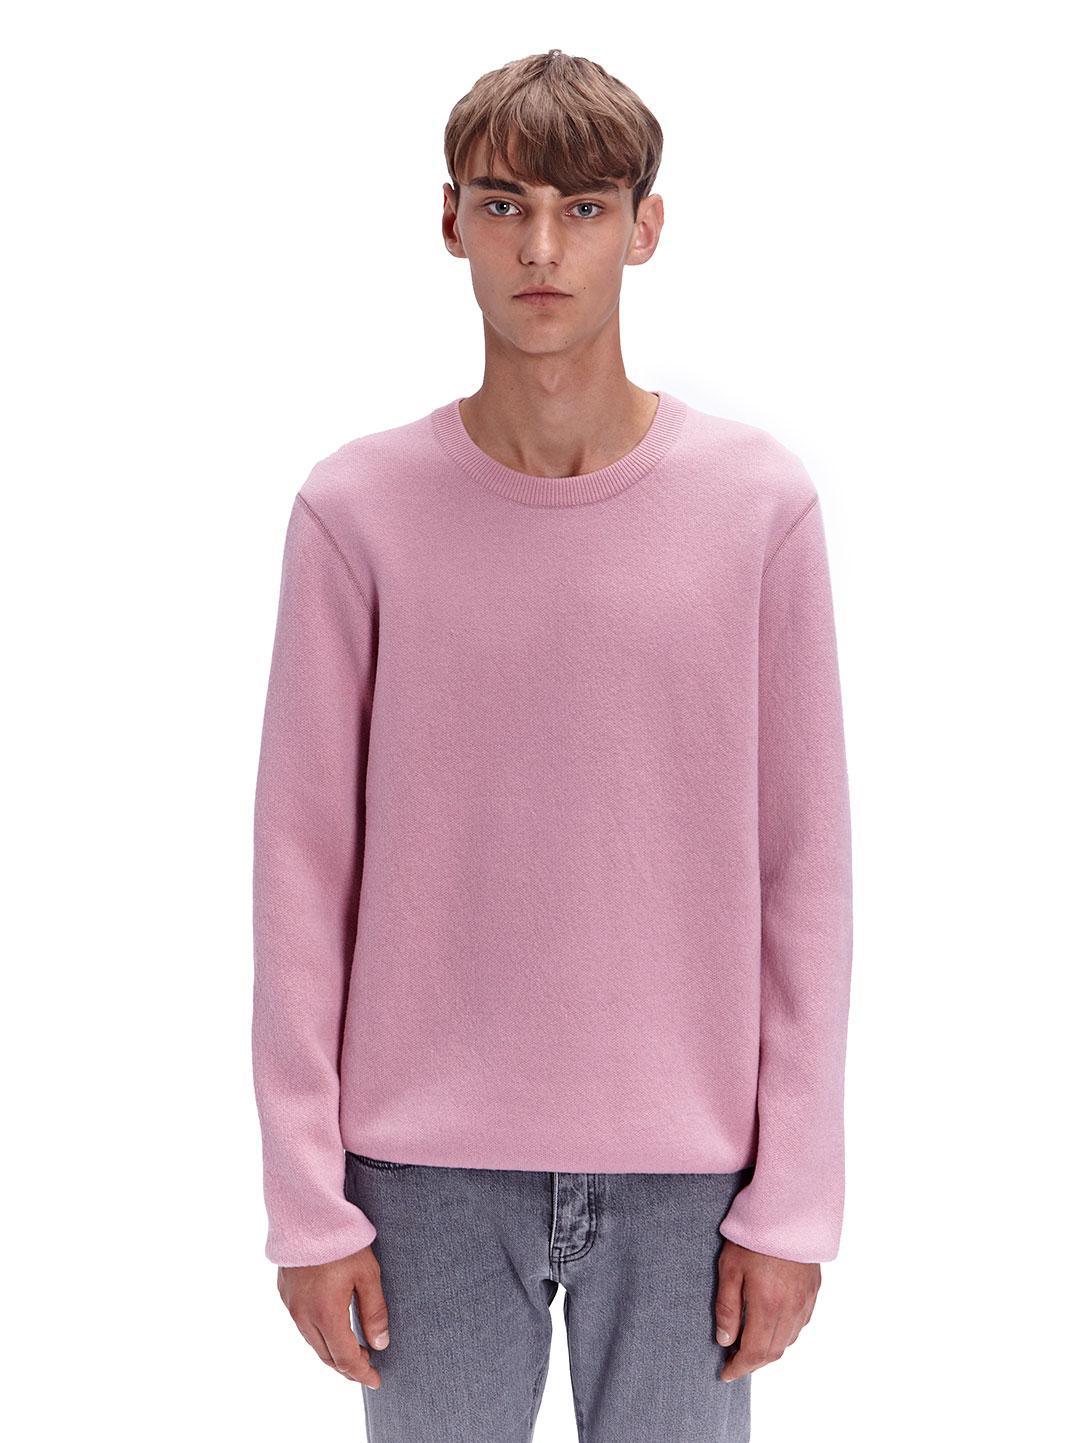 Wool Sweater Grey: Lanvin Mens Bicolour Crew Neck Wool Sweater In Pink